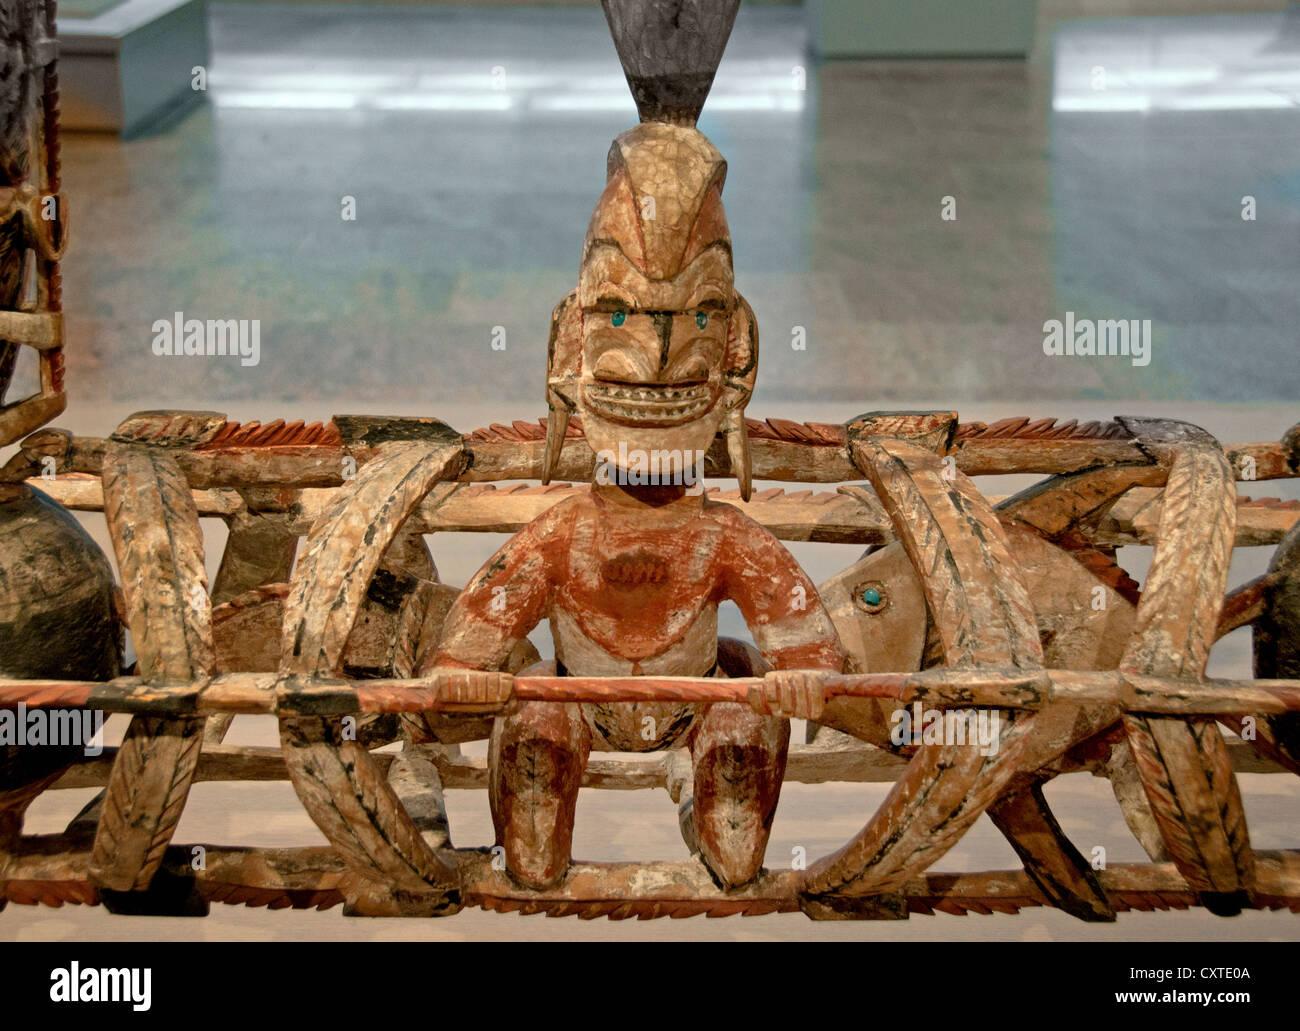 Malanggan Nuova Irlanda Papua Nuova Guinea Oceania Museum Immagini Stock